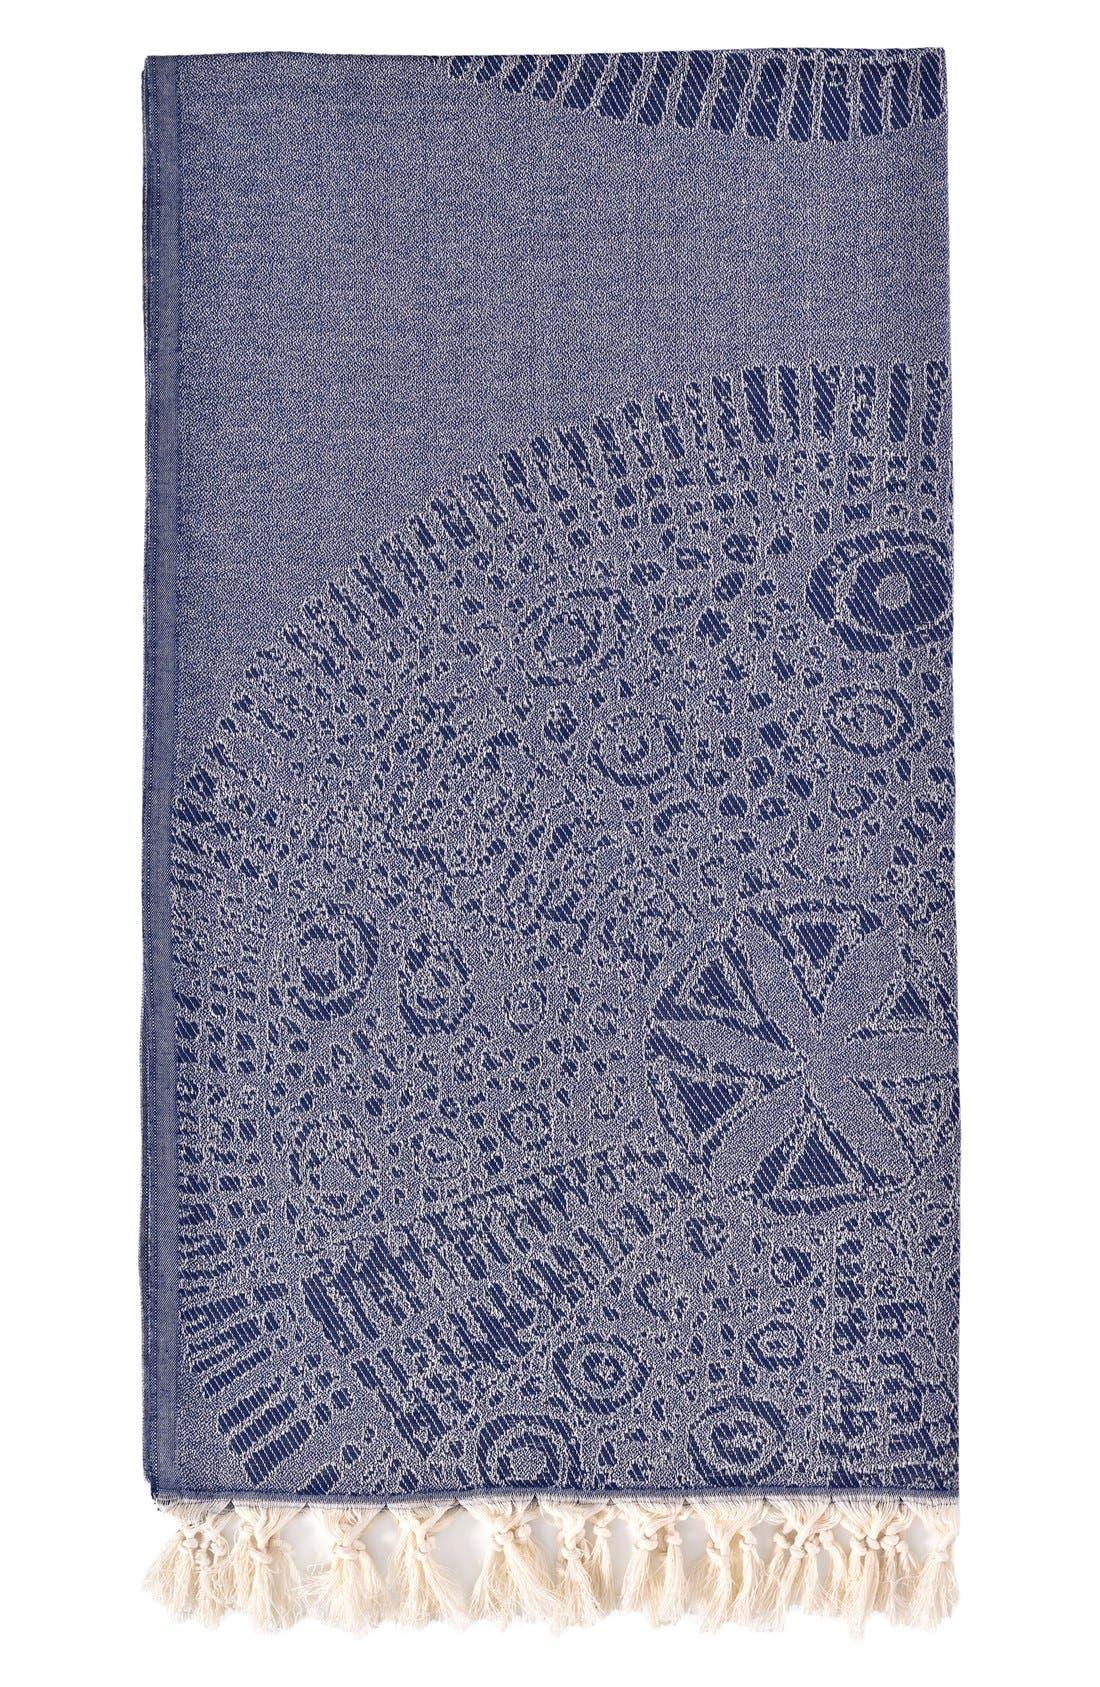 Anatolian Turkish Pestemal Beach Towel,                             Main thumbnail 1, color,                             400